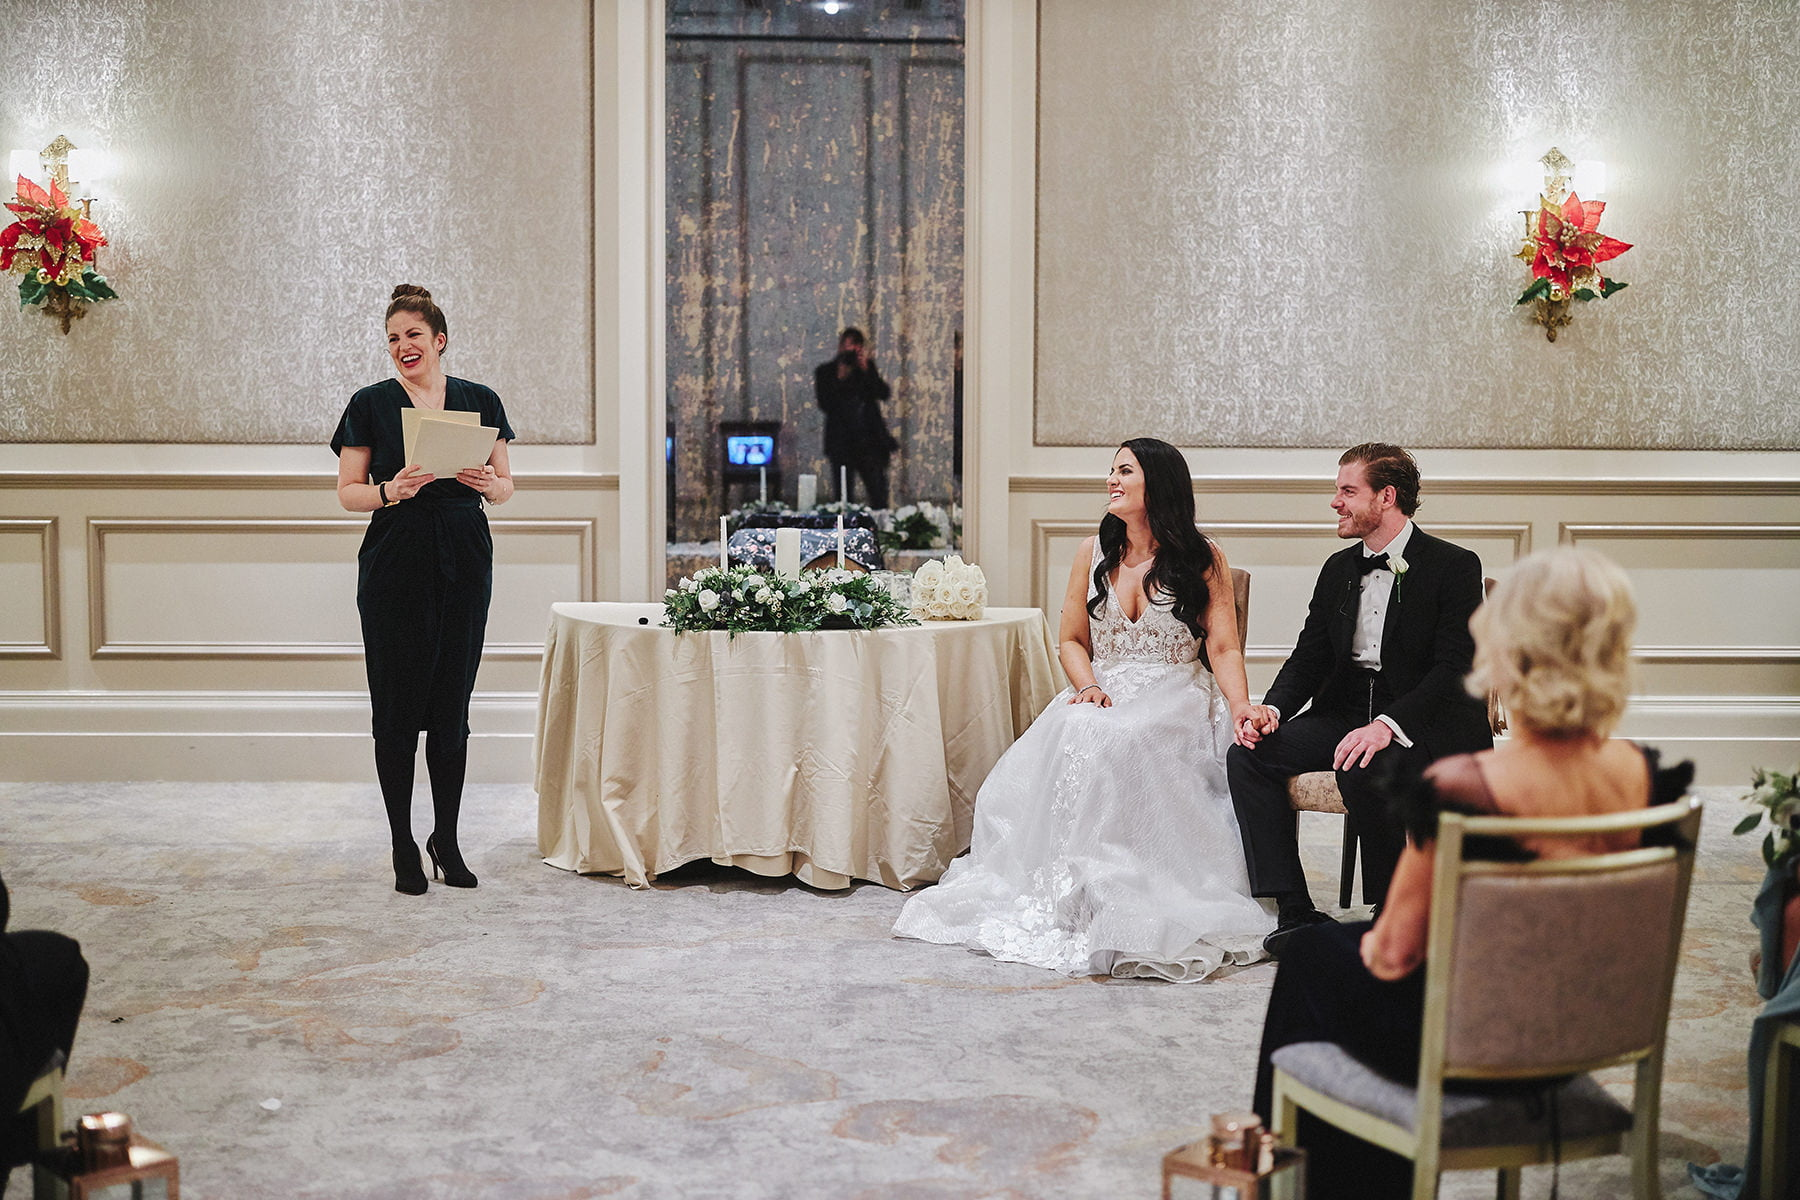 POWERSCOURT HOTEL RESORT INTIMATE WEDDING 46